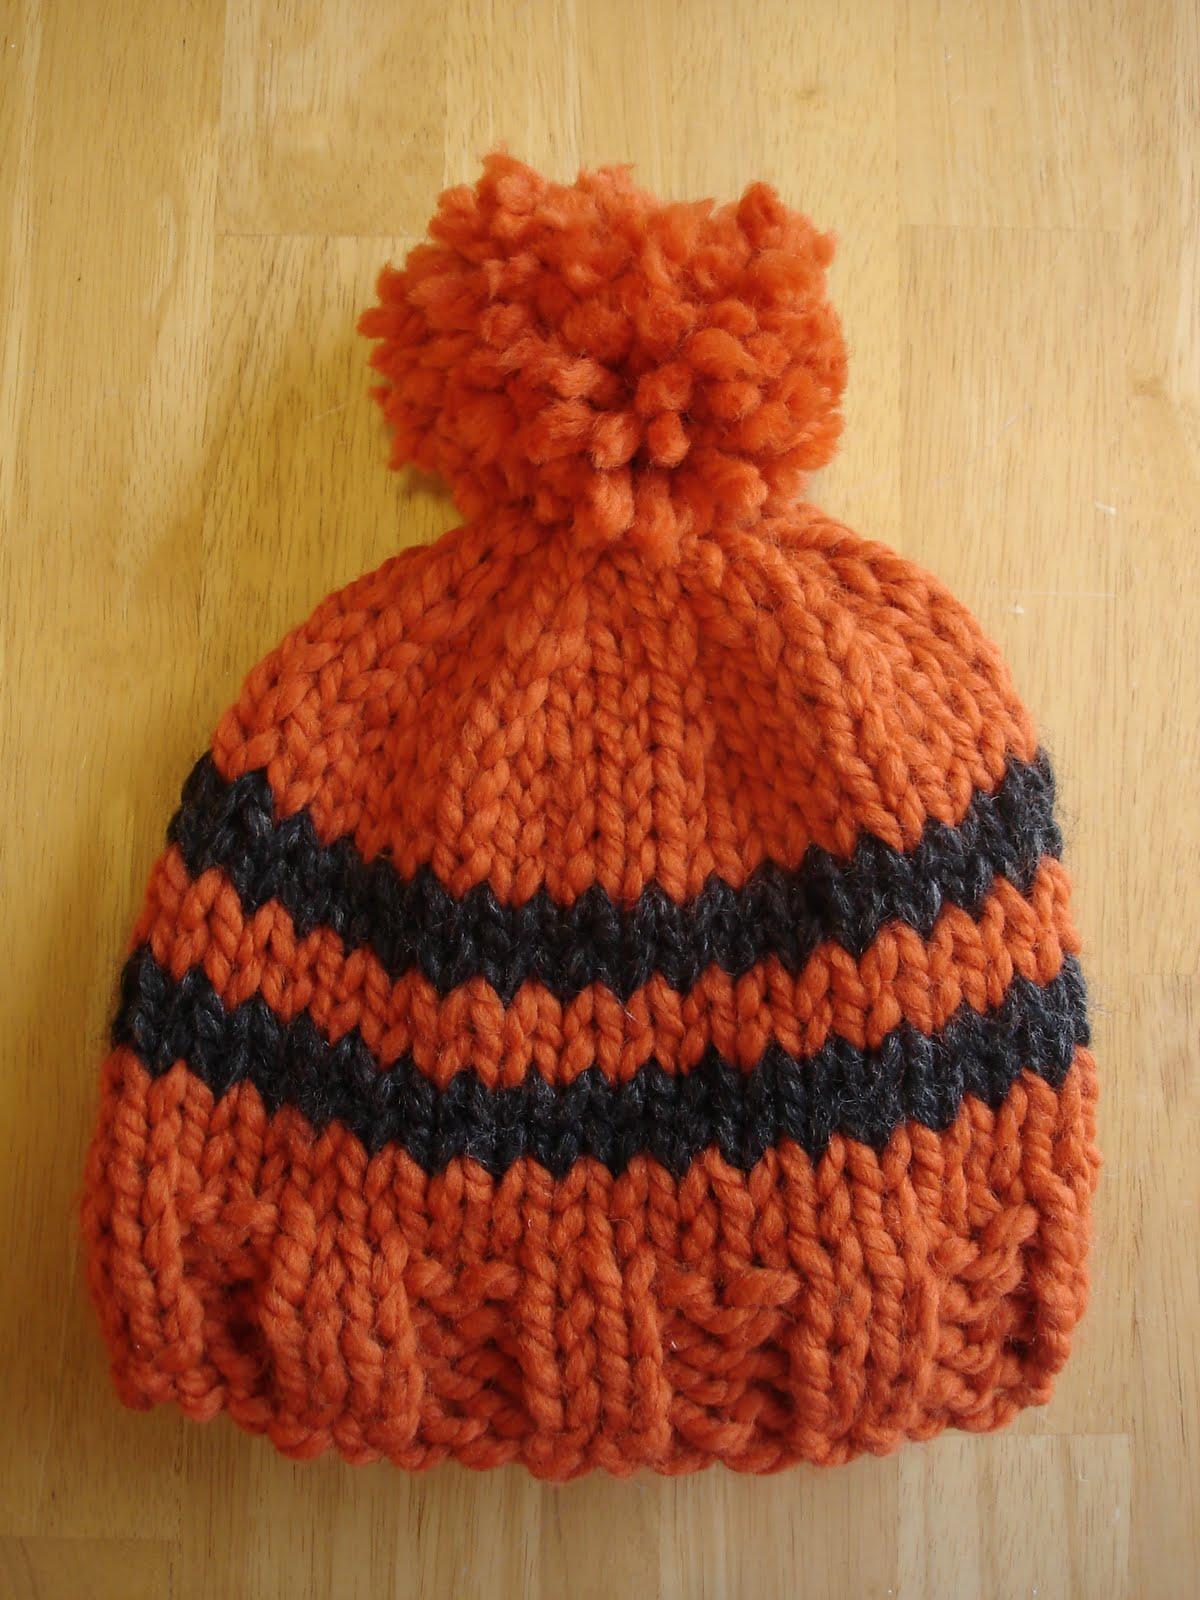 Lujo Knit Kid Hat Pattern Cresta - Manta de Tejer Patrón de Ideas ...